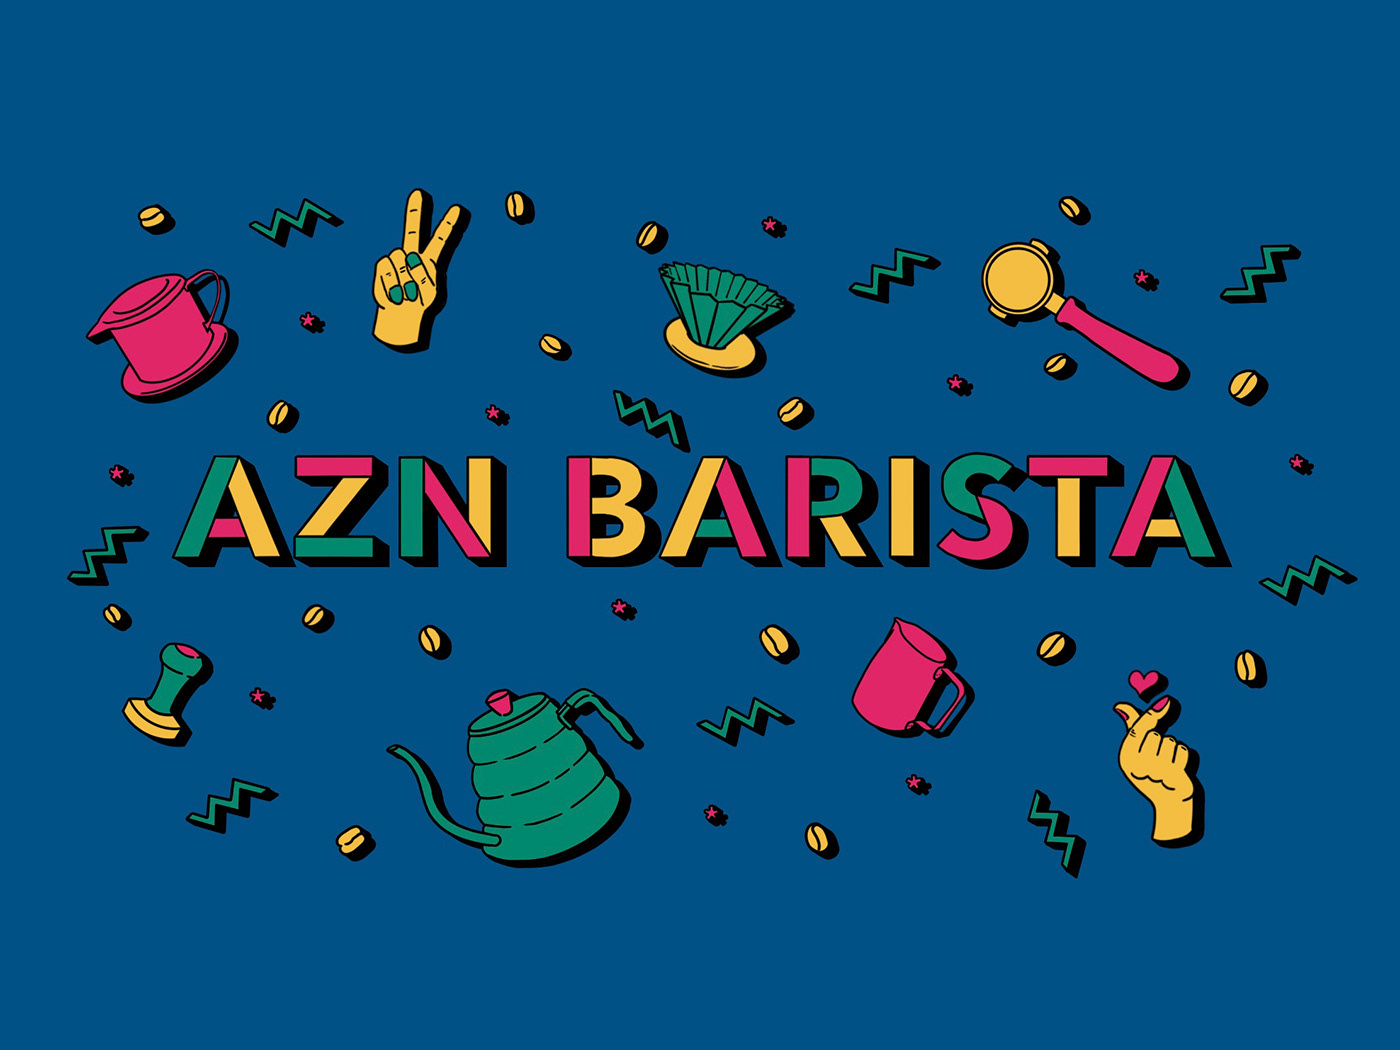 asian barista azn barista barista Coffee hario korean heart origami  Portafilter slow pour design Tshirt Design typography